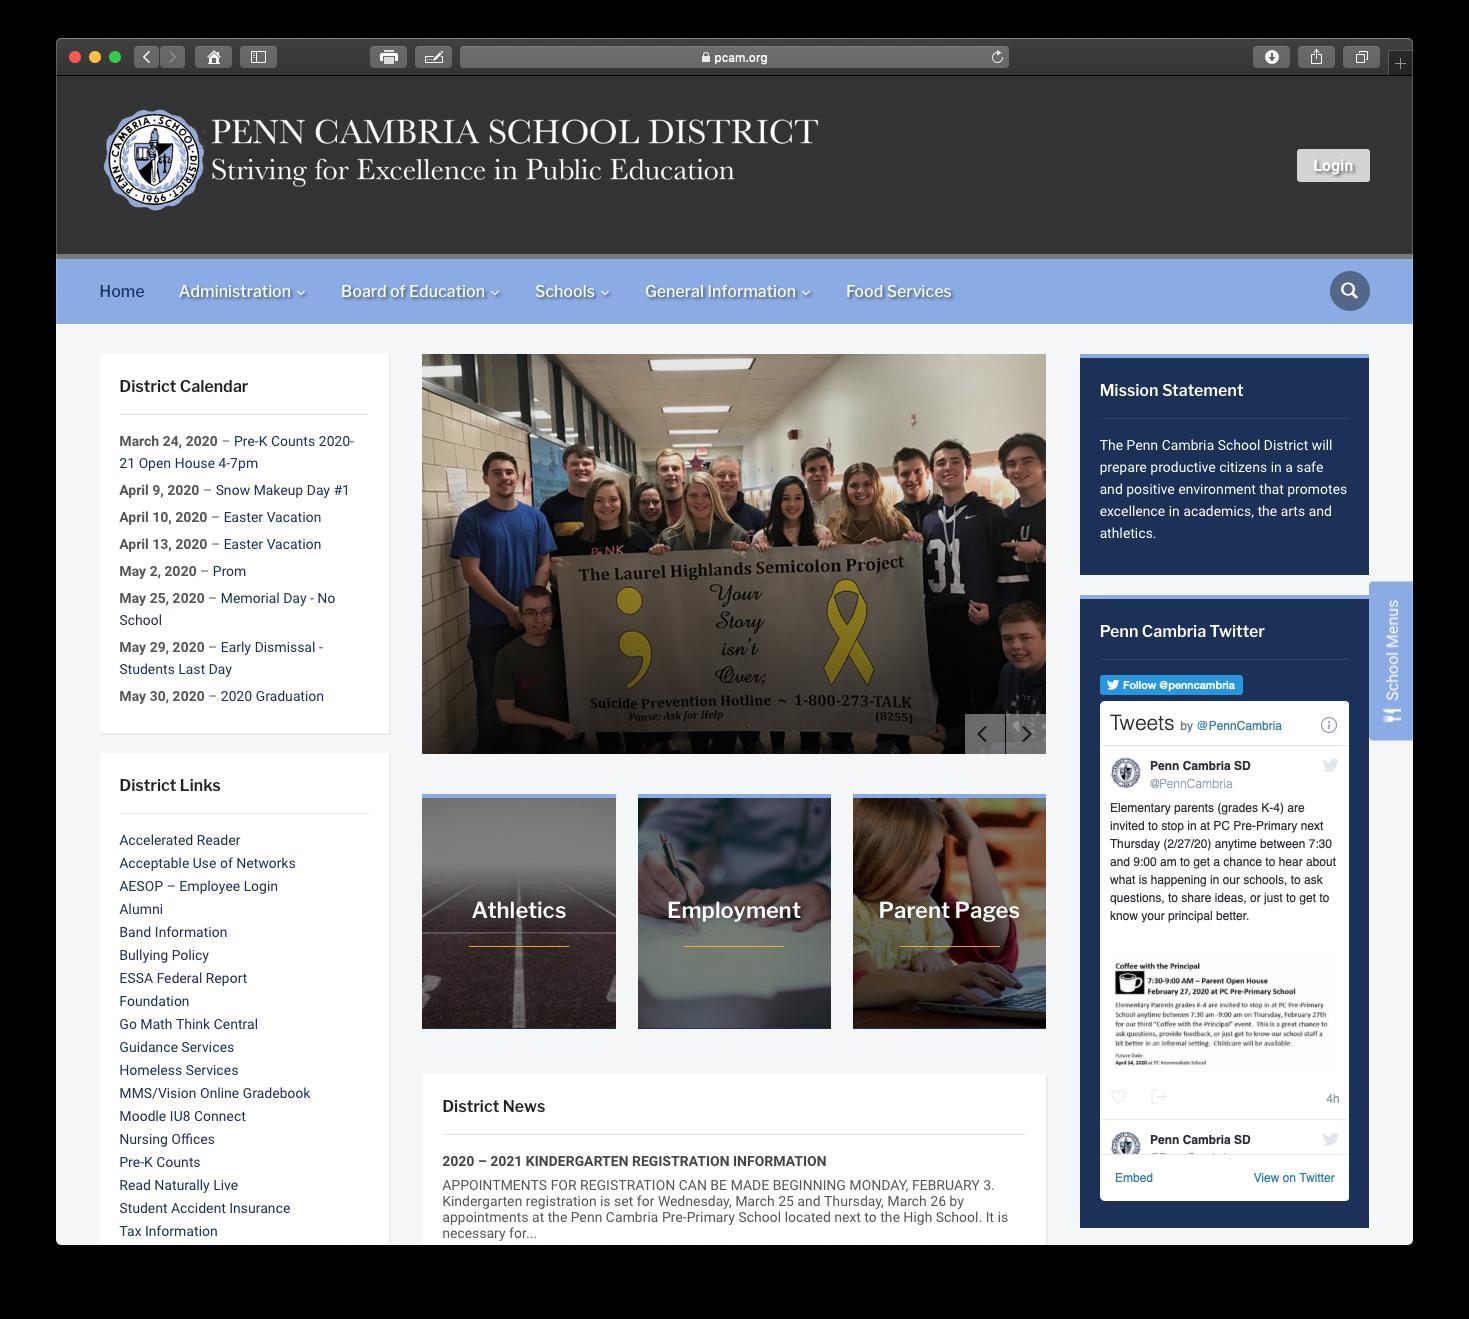 Penn Cambria School District